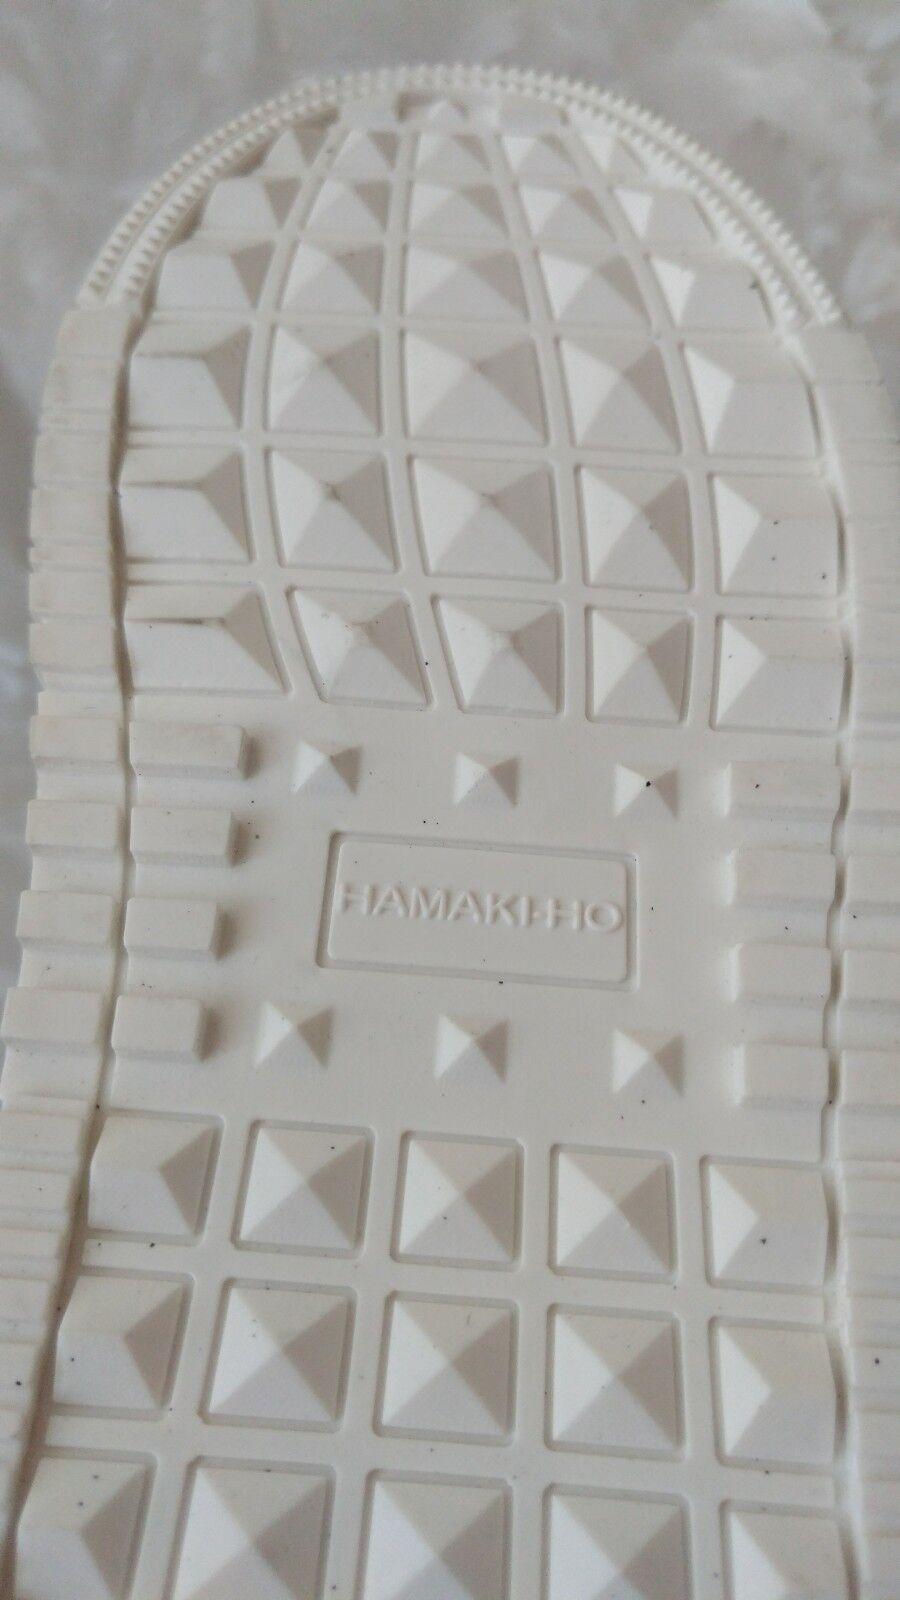 HAMAKI-HO  TG. 42. Made Made Made in   0d573f